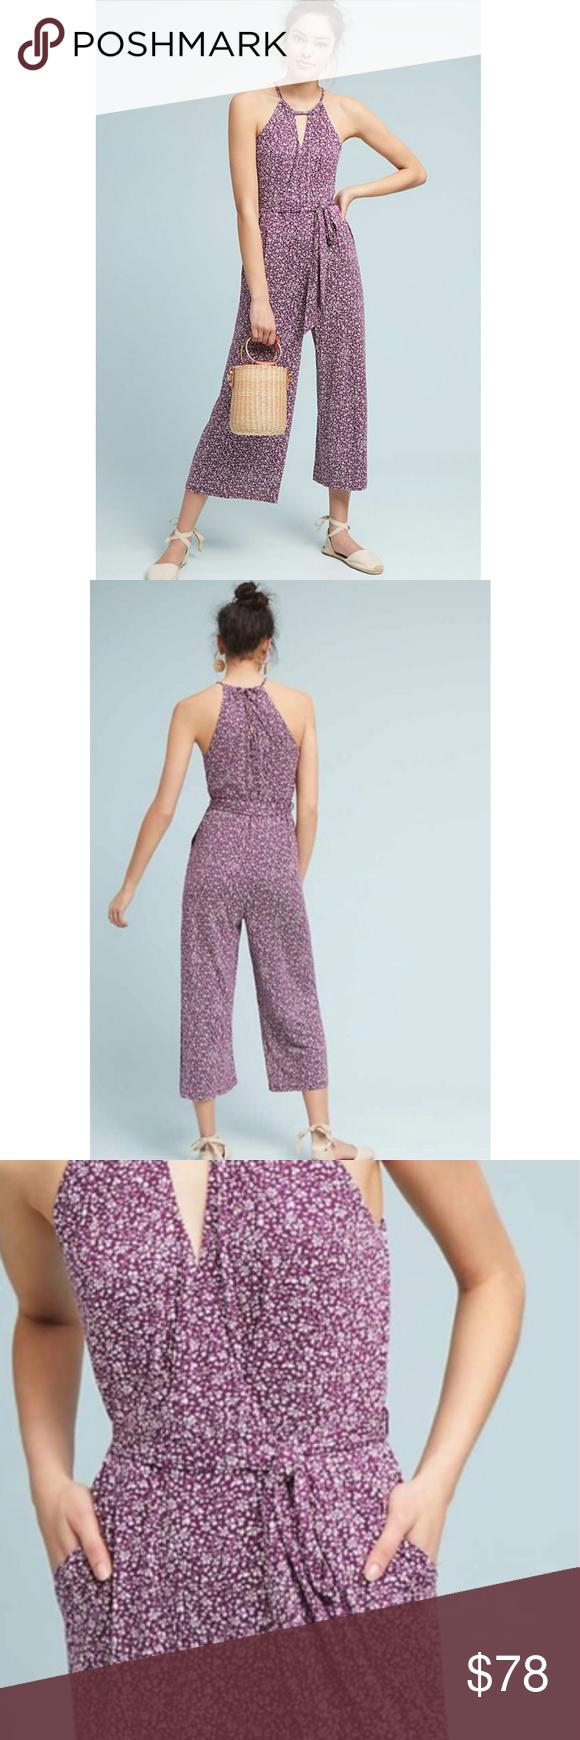 180ee9bbe0eb Anthropologie Maeve Claremont Purple Jumpsuit NWT New with tags. Anthropologie  Maeve Claremont jumpsuit. Purple